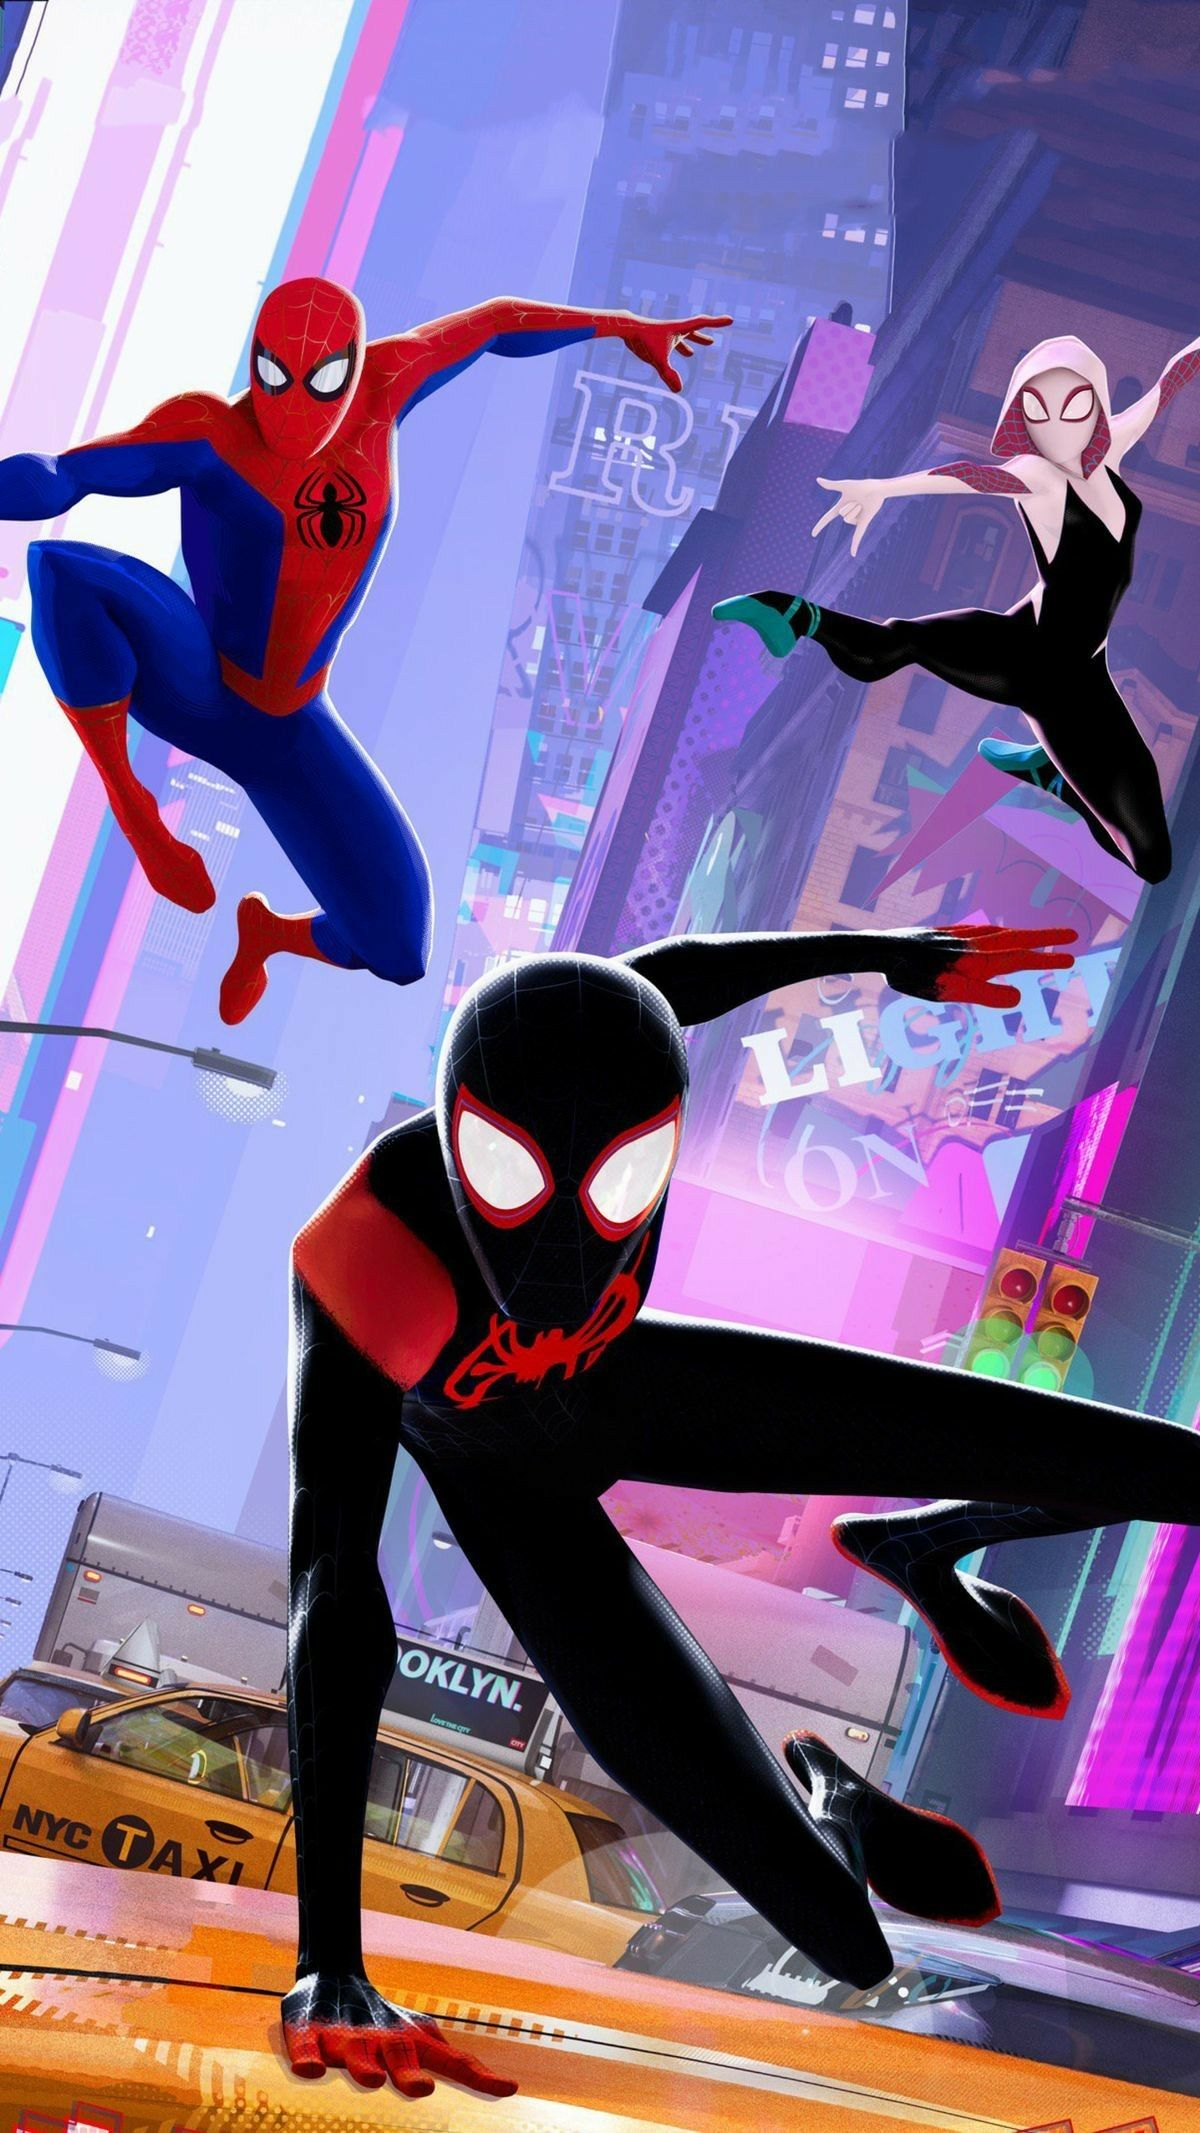 Pin By Meezie On Spider Man Marvel Spiderman Spiderman Ultimate Spiderman